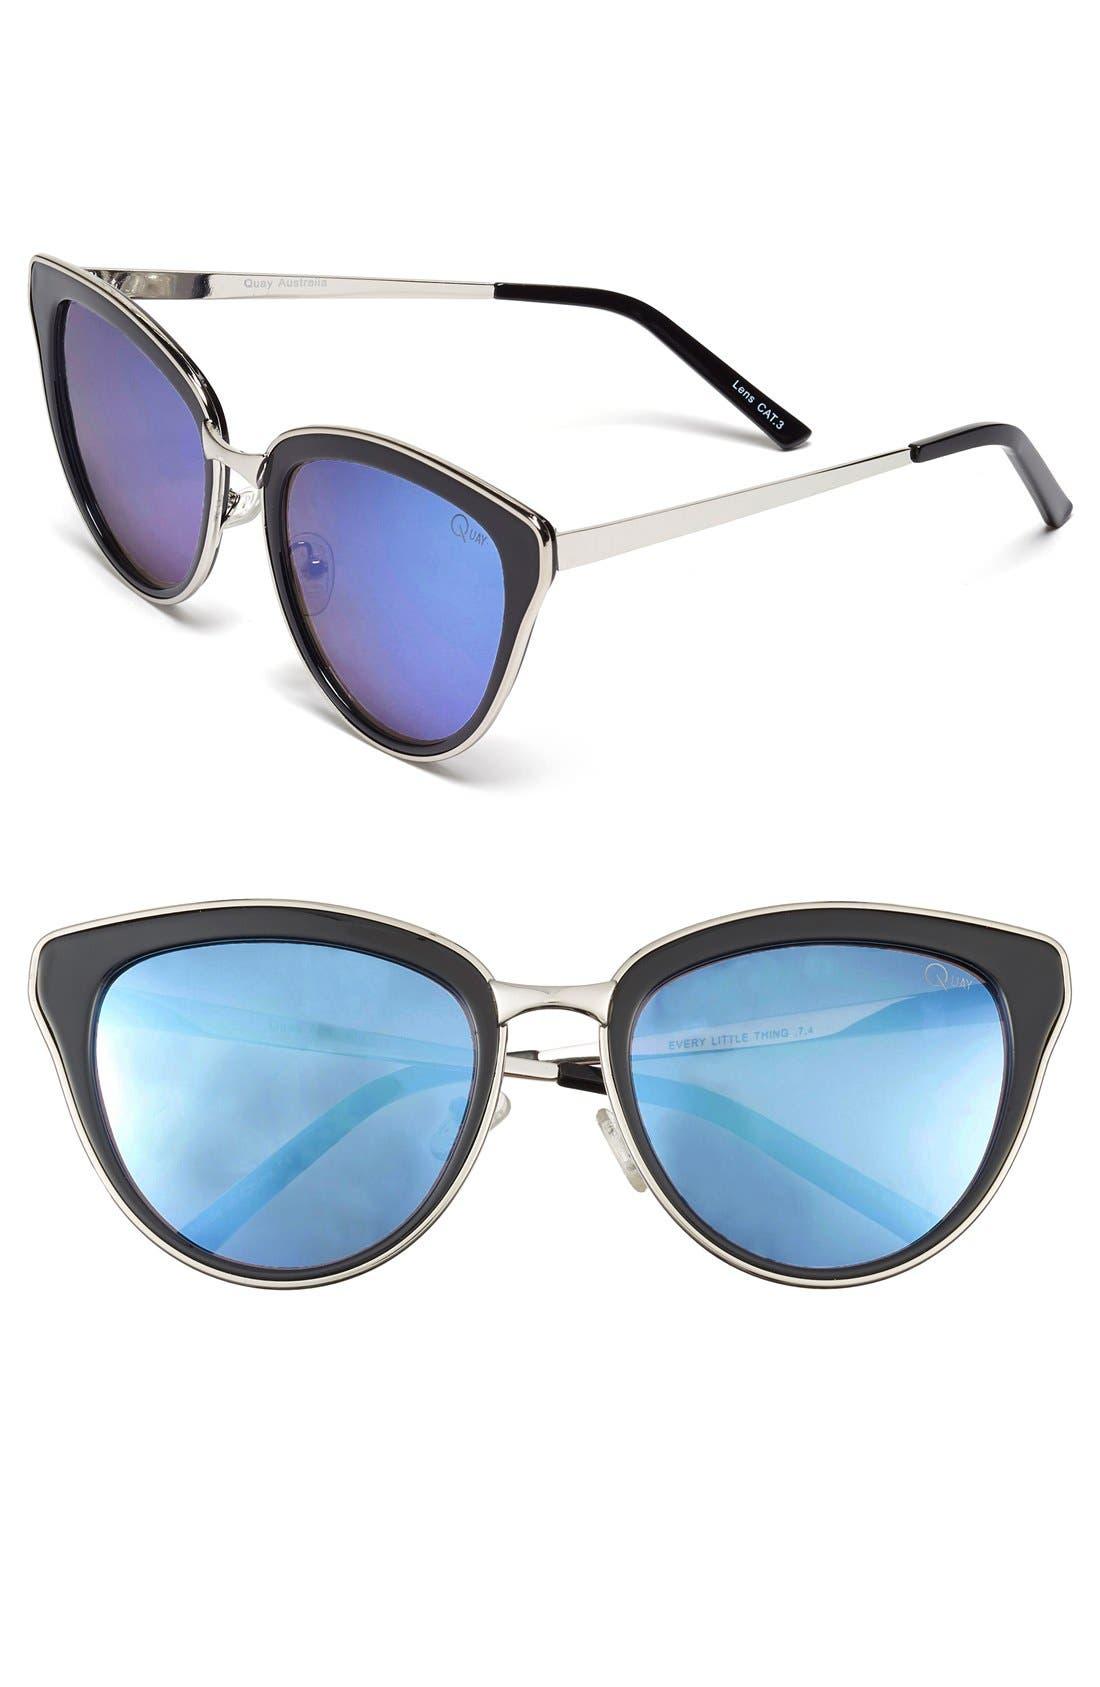 QUAY AUSTRALIA 'Every Little Thing' 54mm Cat Eye Sunglasses, Main, color, 002